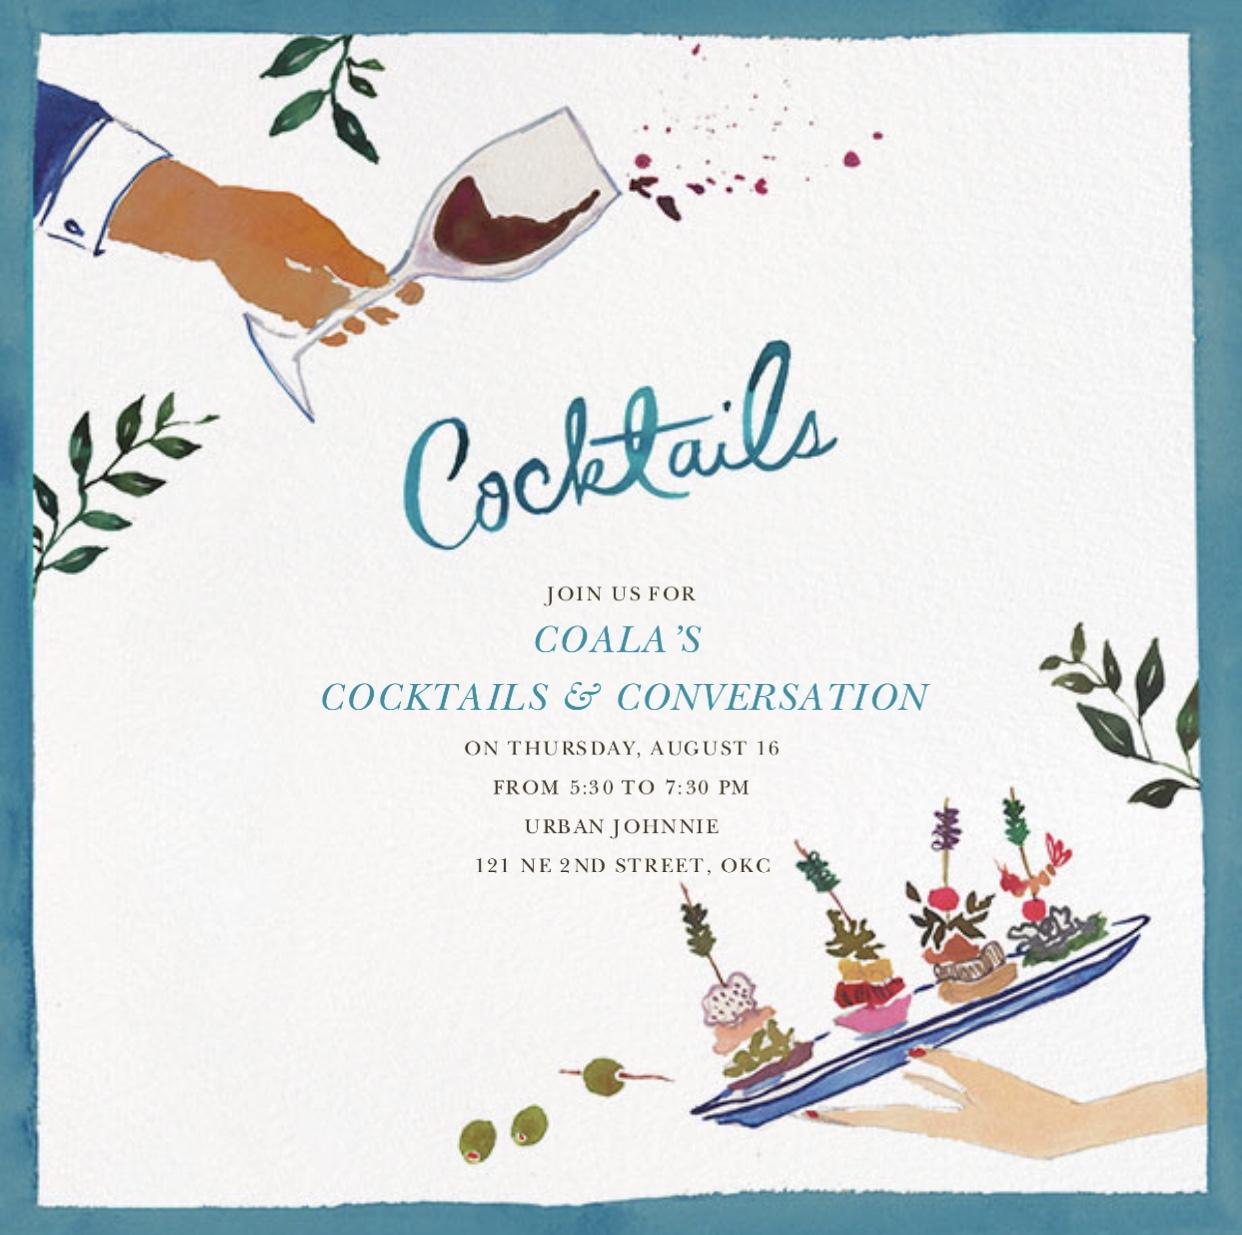 Cocktails & Conversation - Aug 2018.jpg